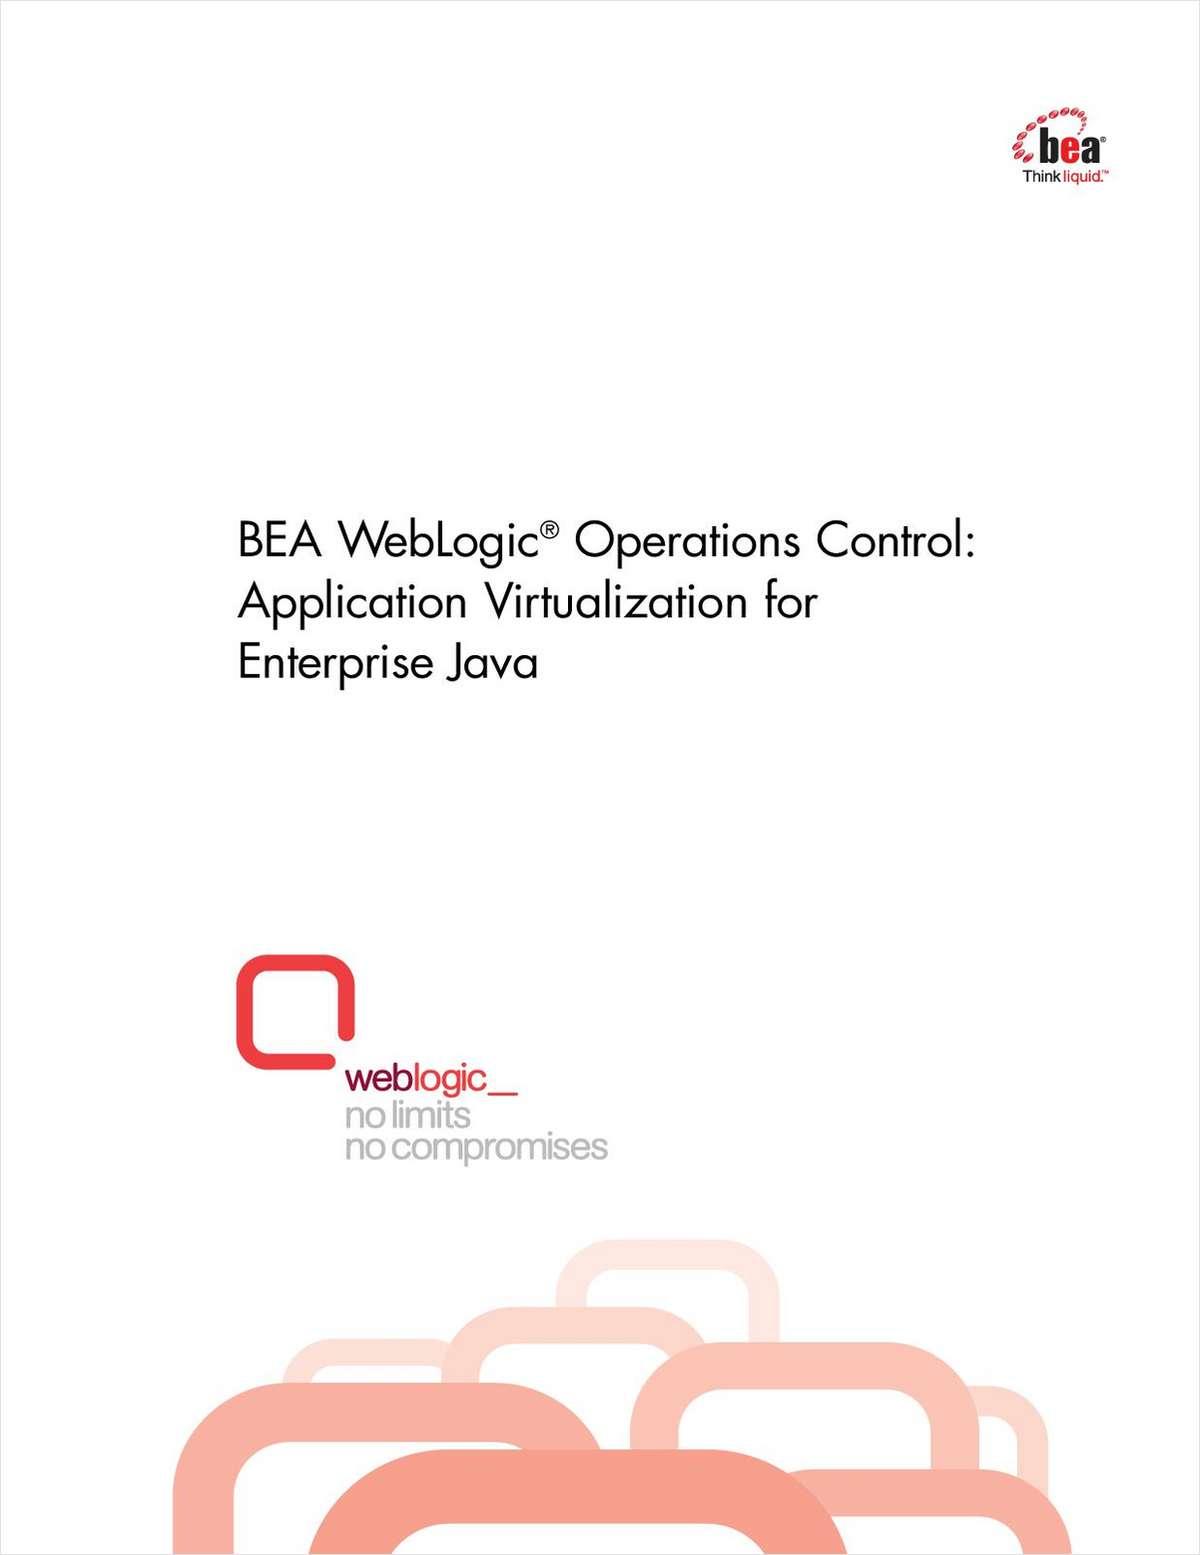 BEA WebLogic® Operations Control: Application Virtualization for Enterprise Java